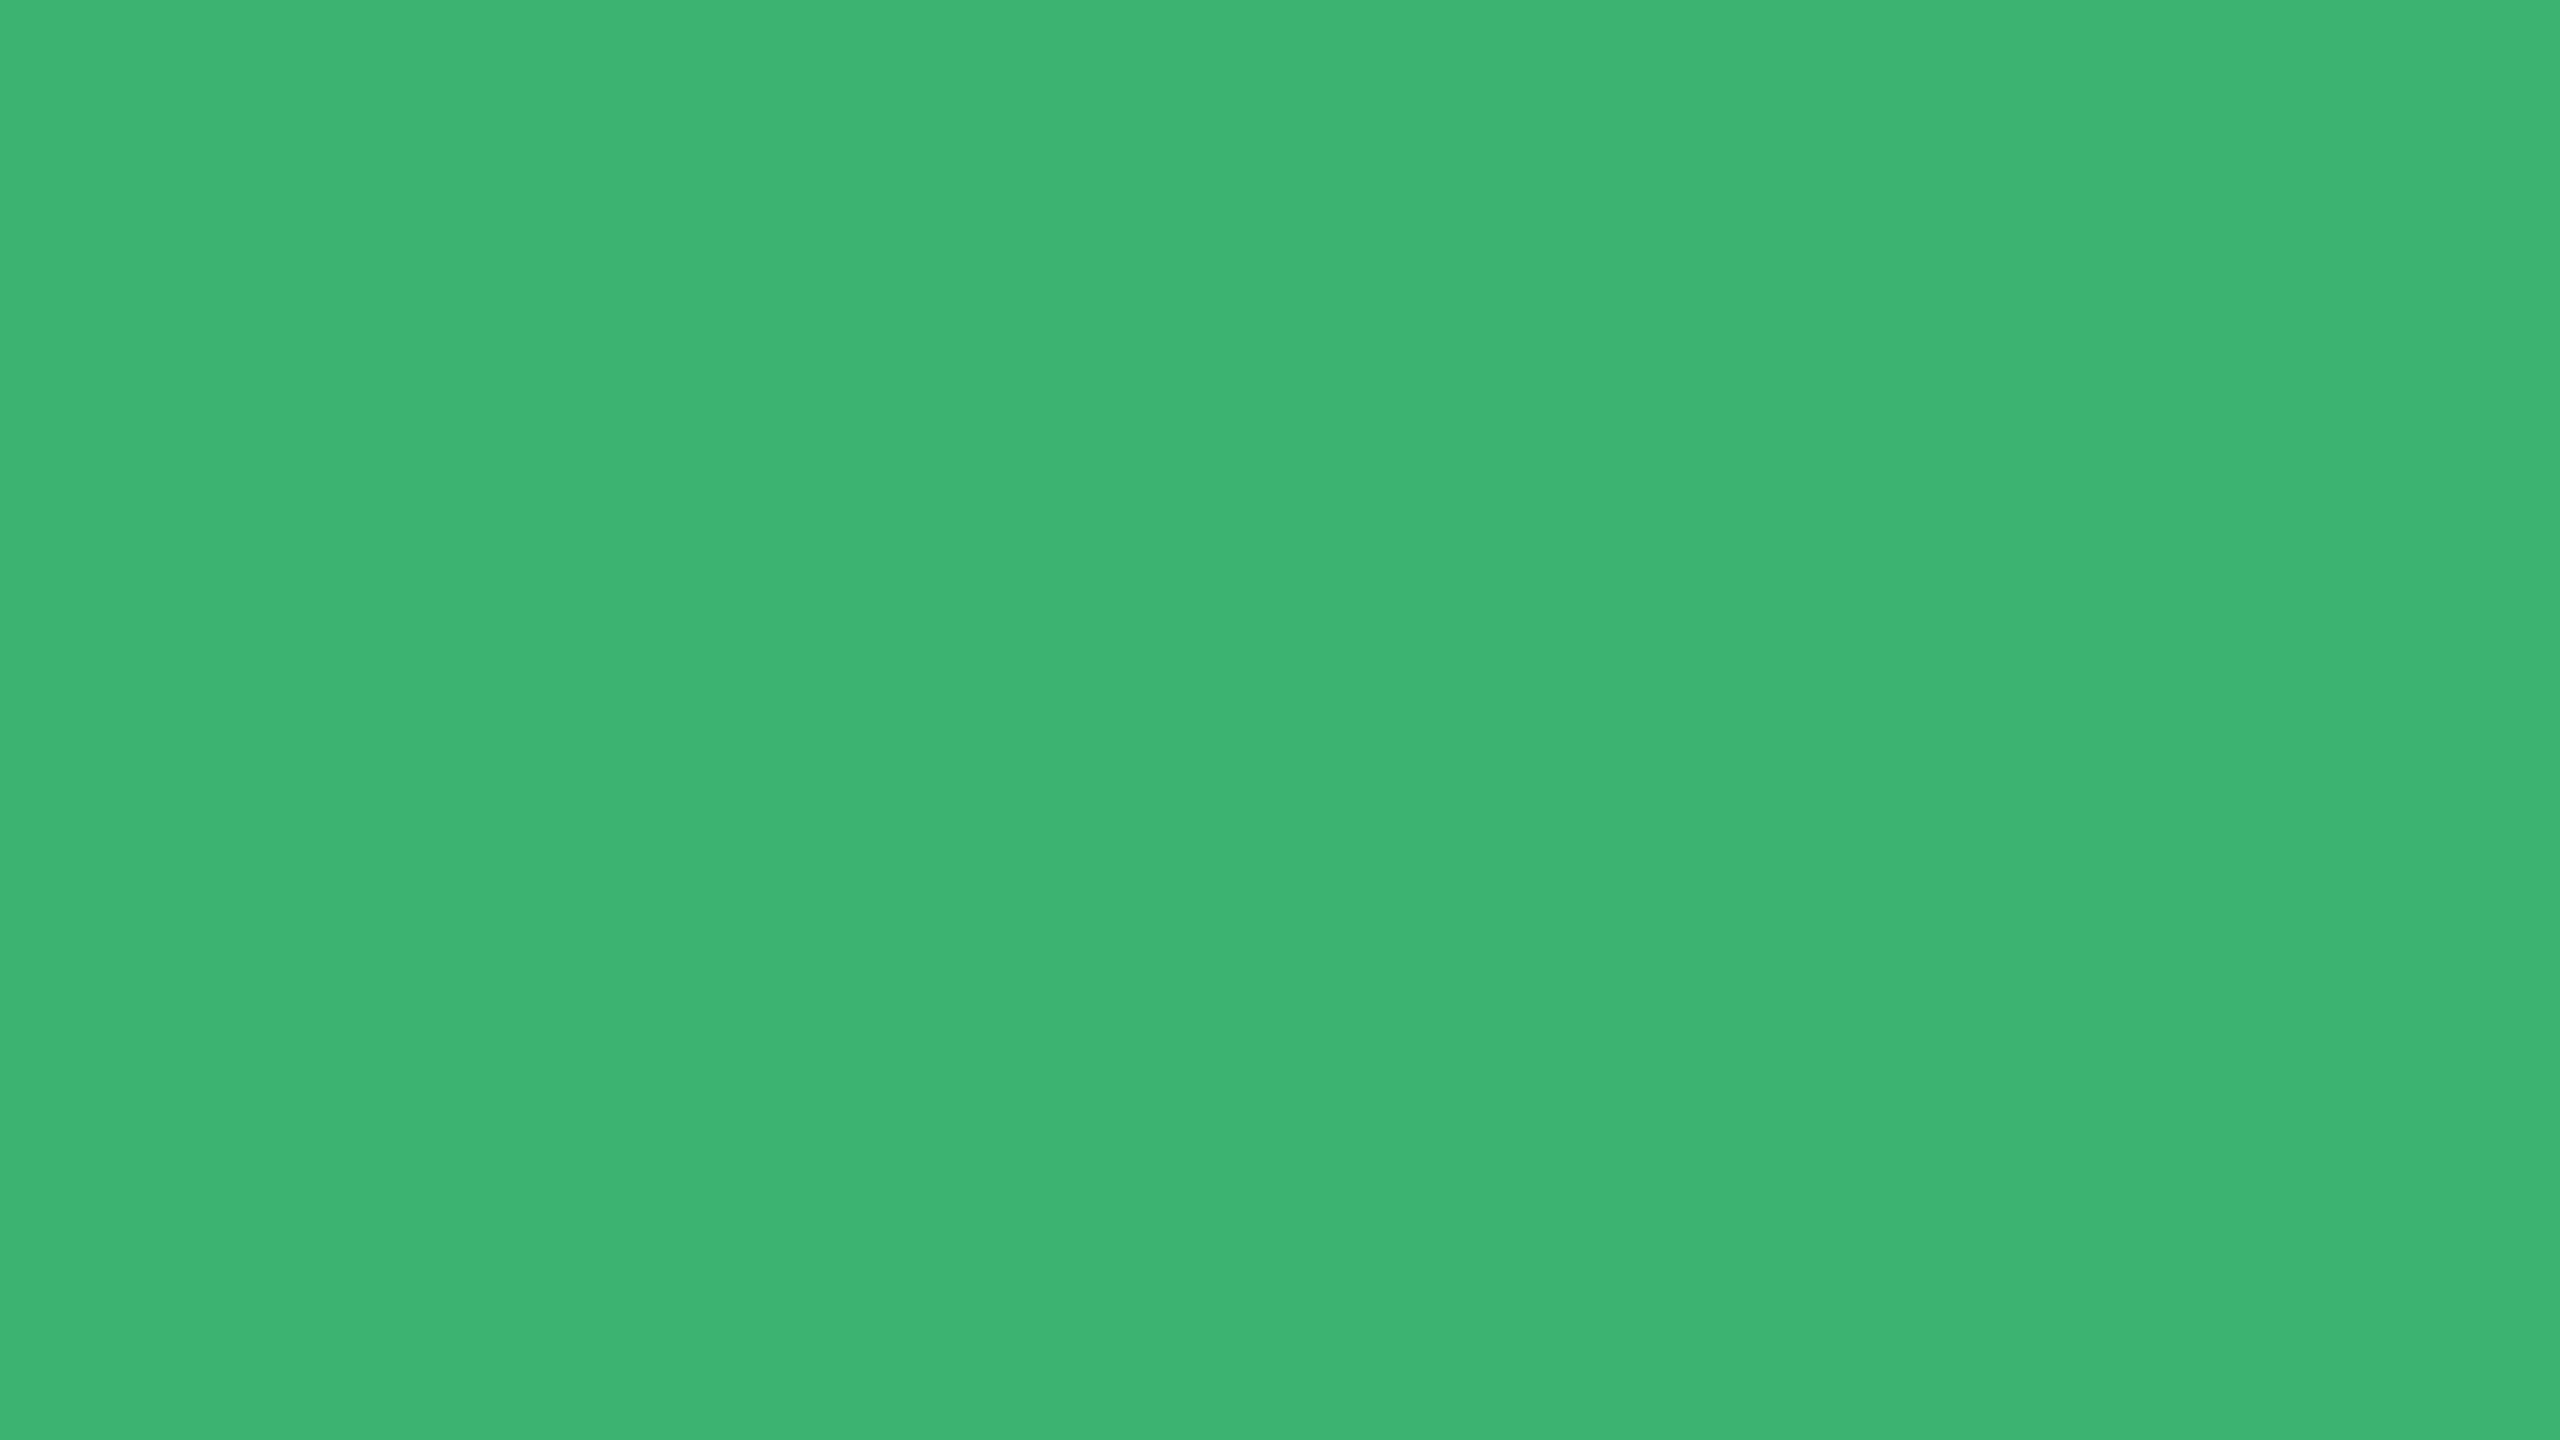 2560x1440 Medium Sea Green Solid Color Background